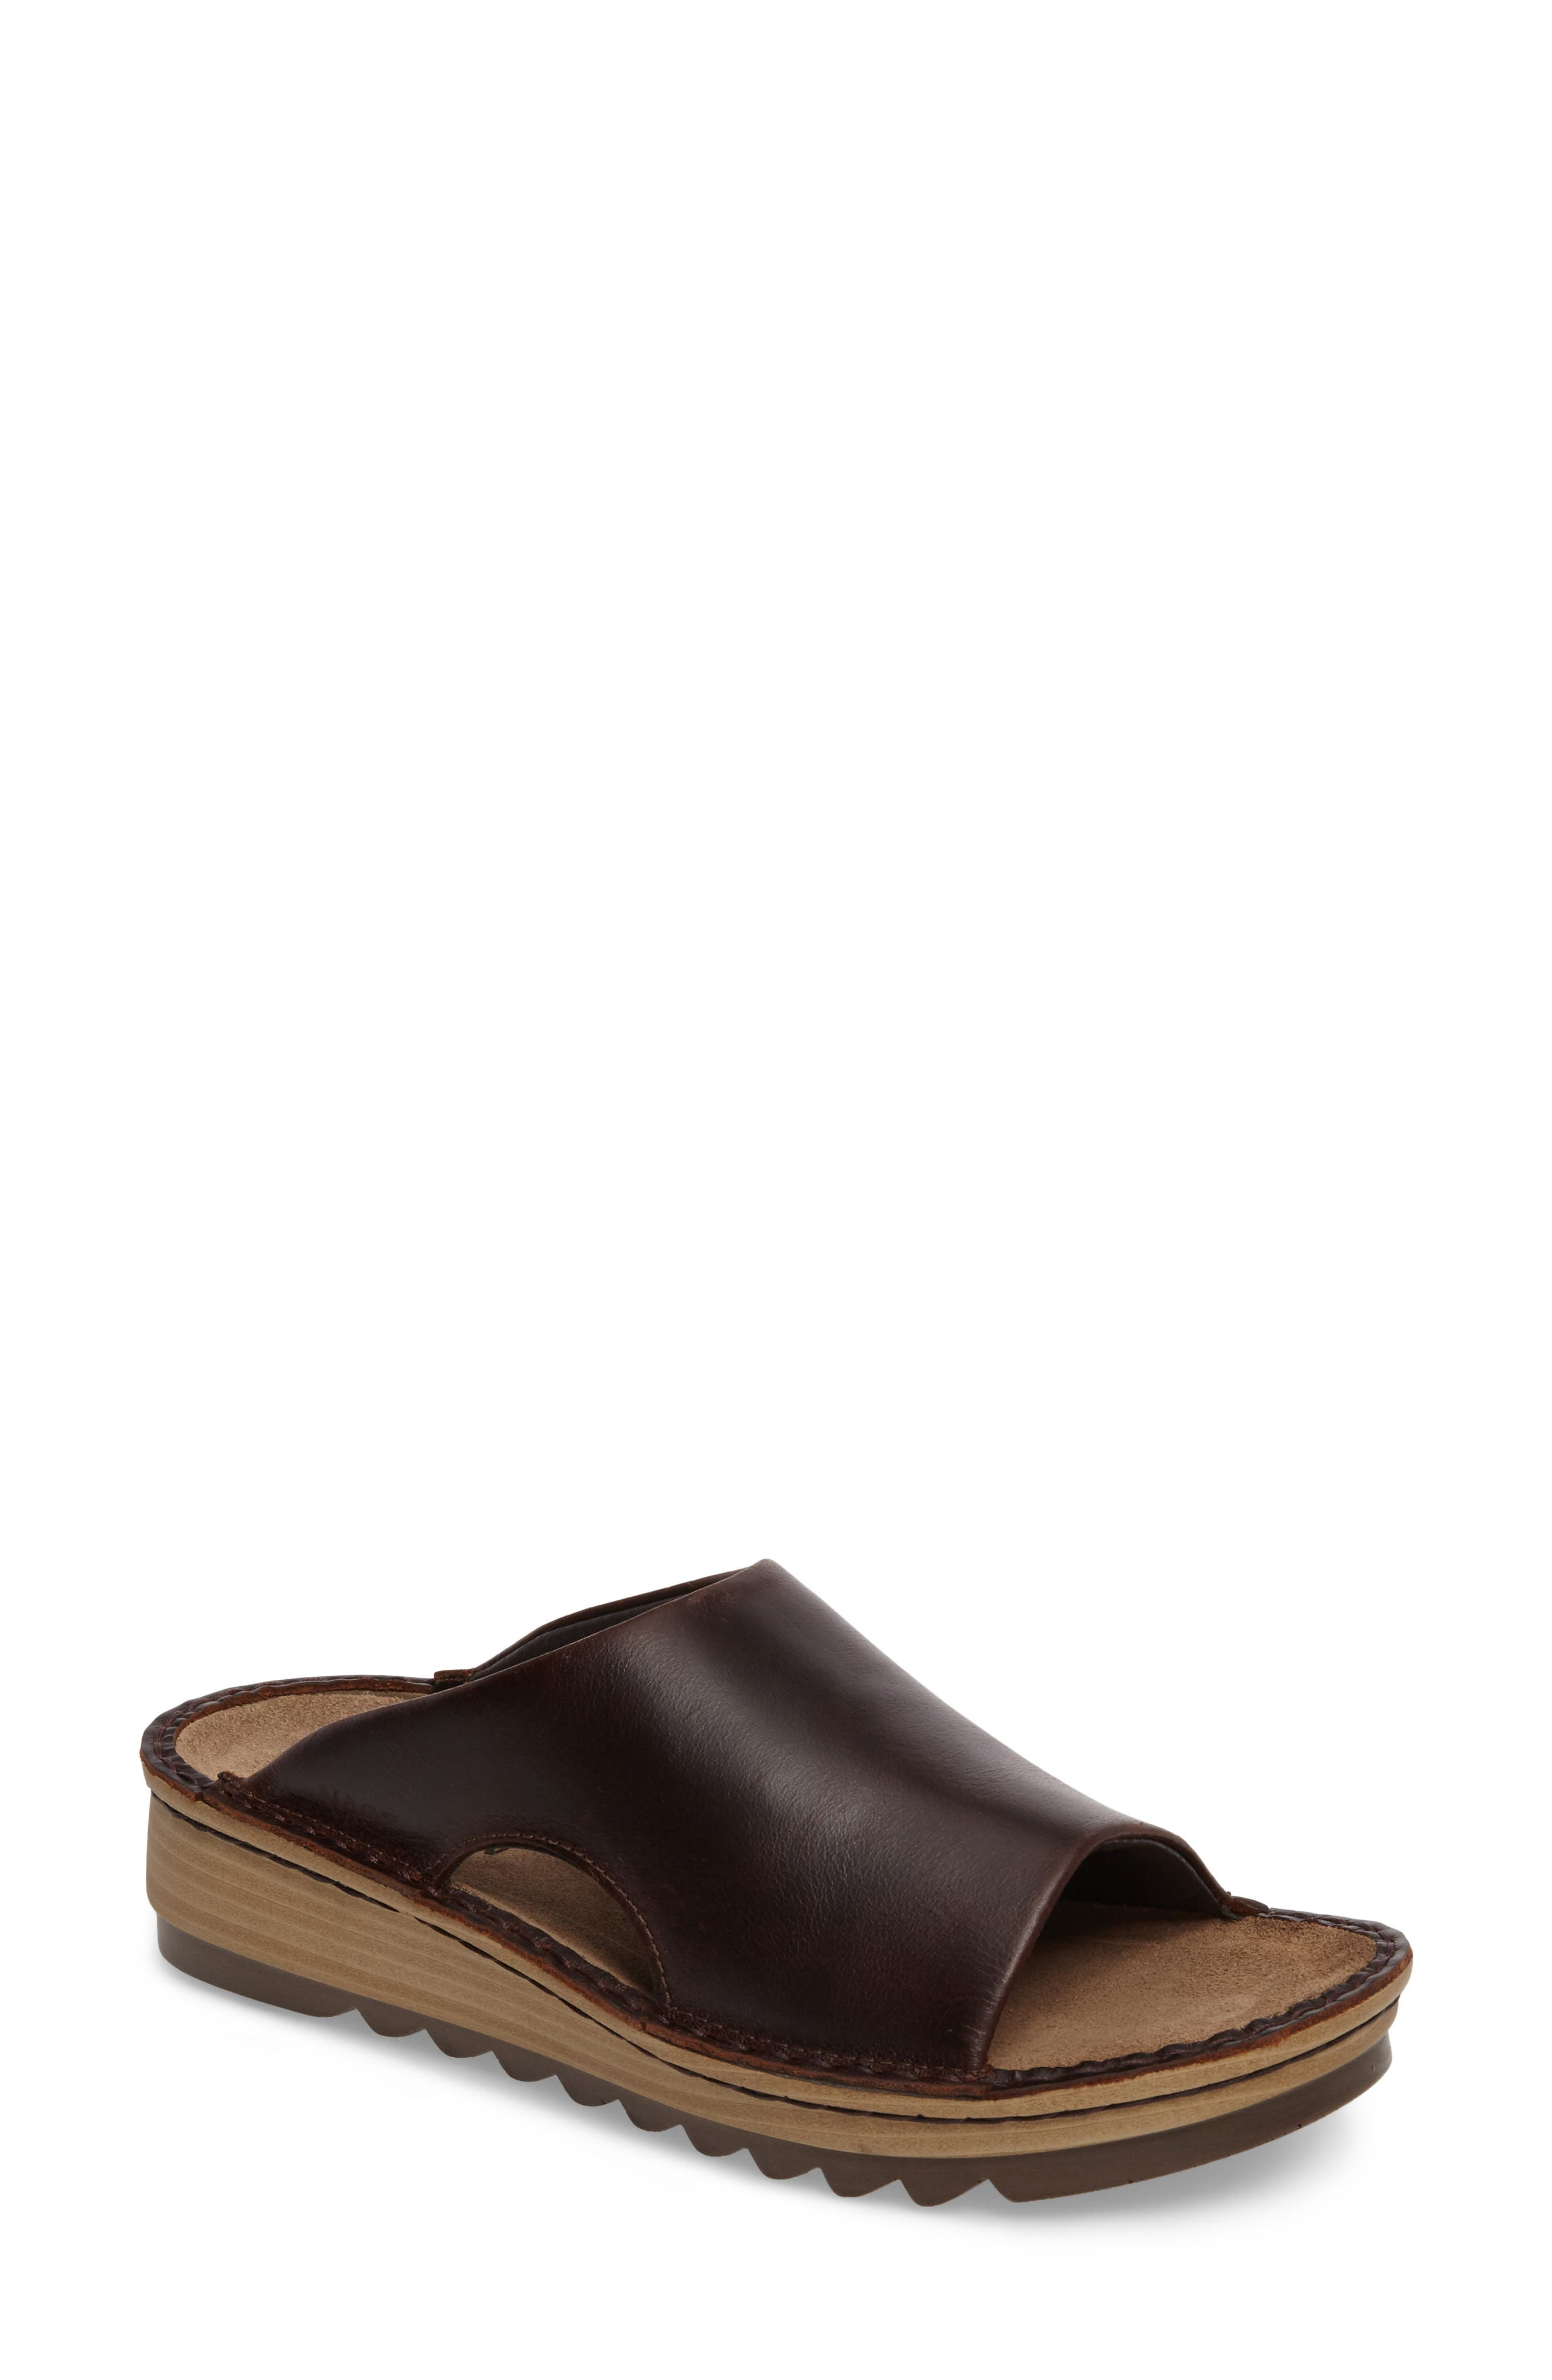 'Ardisia' Slide Sandal,                             Main thumbnail 1, color,                             Buffalo Leather